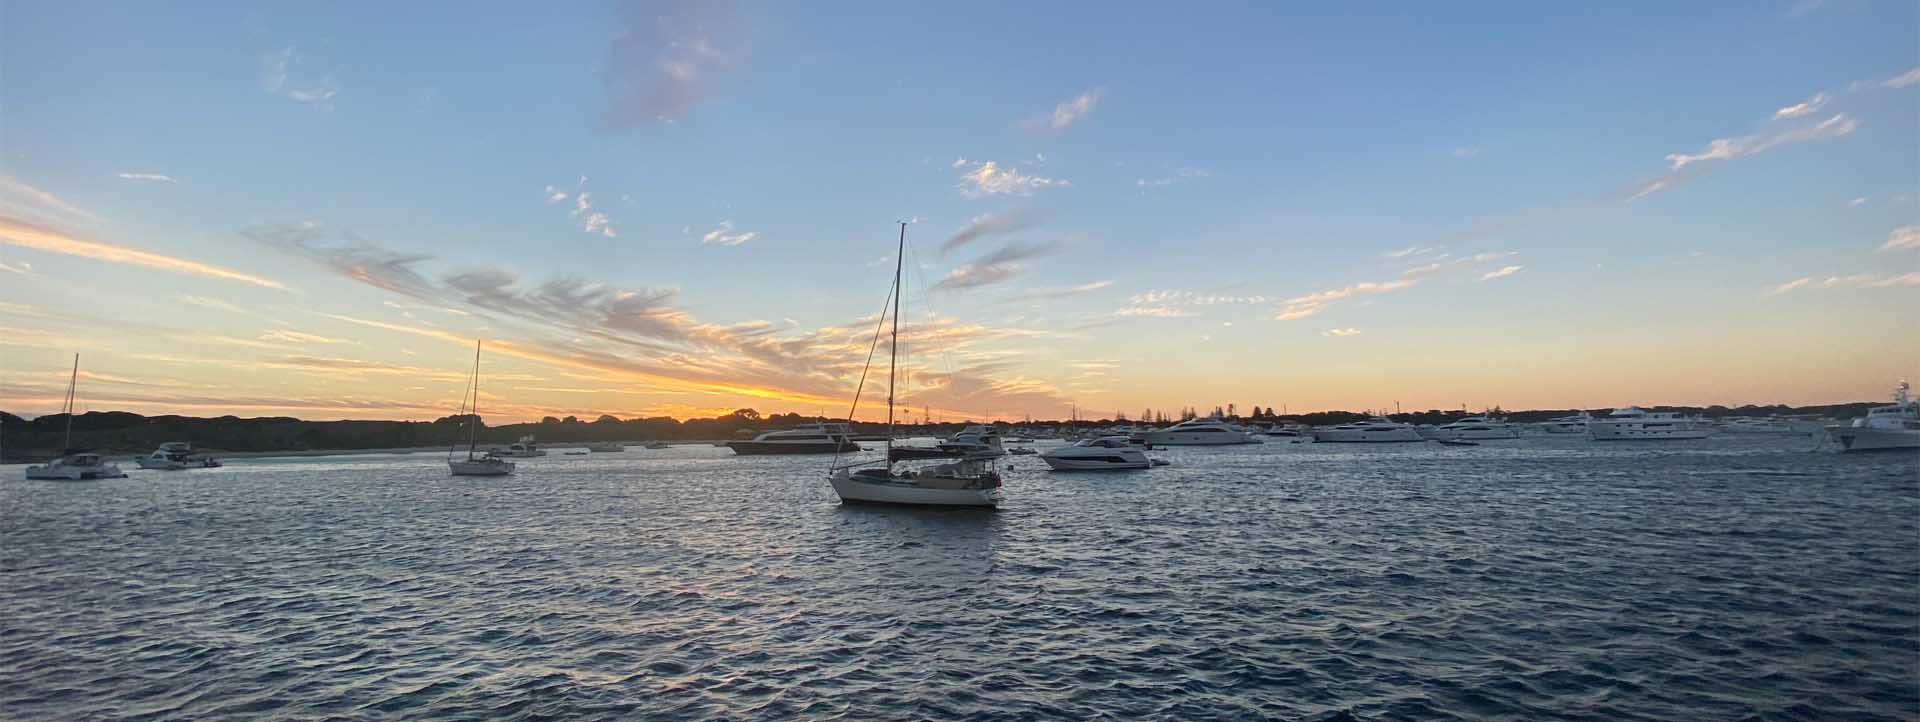 ROTTNEST ISLAND TWILIGHT SUNSET THOMSON BAY